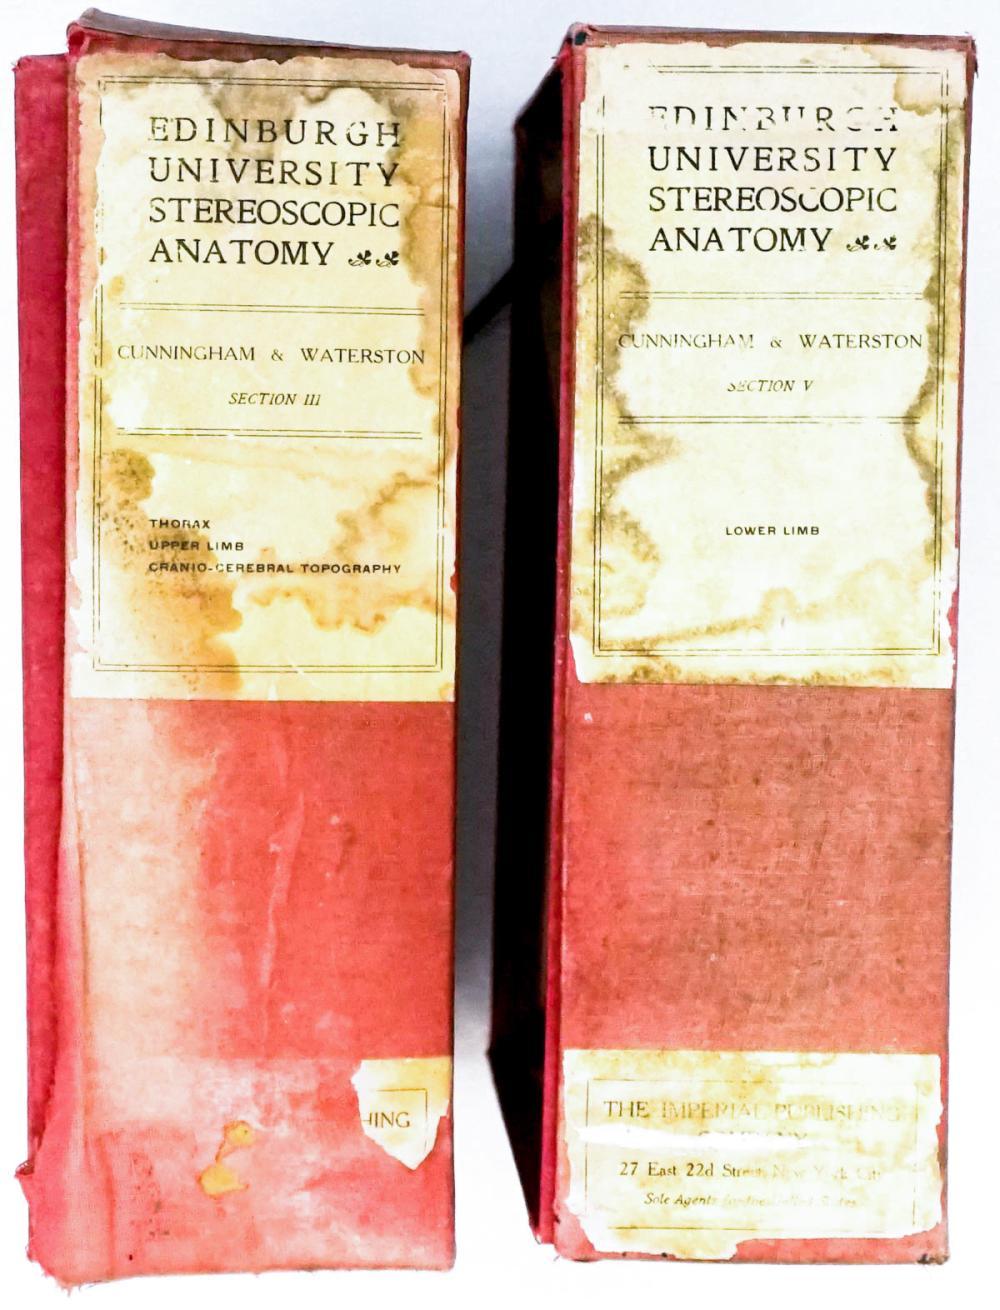 Lot 507: Edinburgh Stereoscopic Atlas of Anatomy (122)